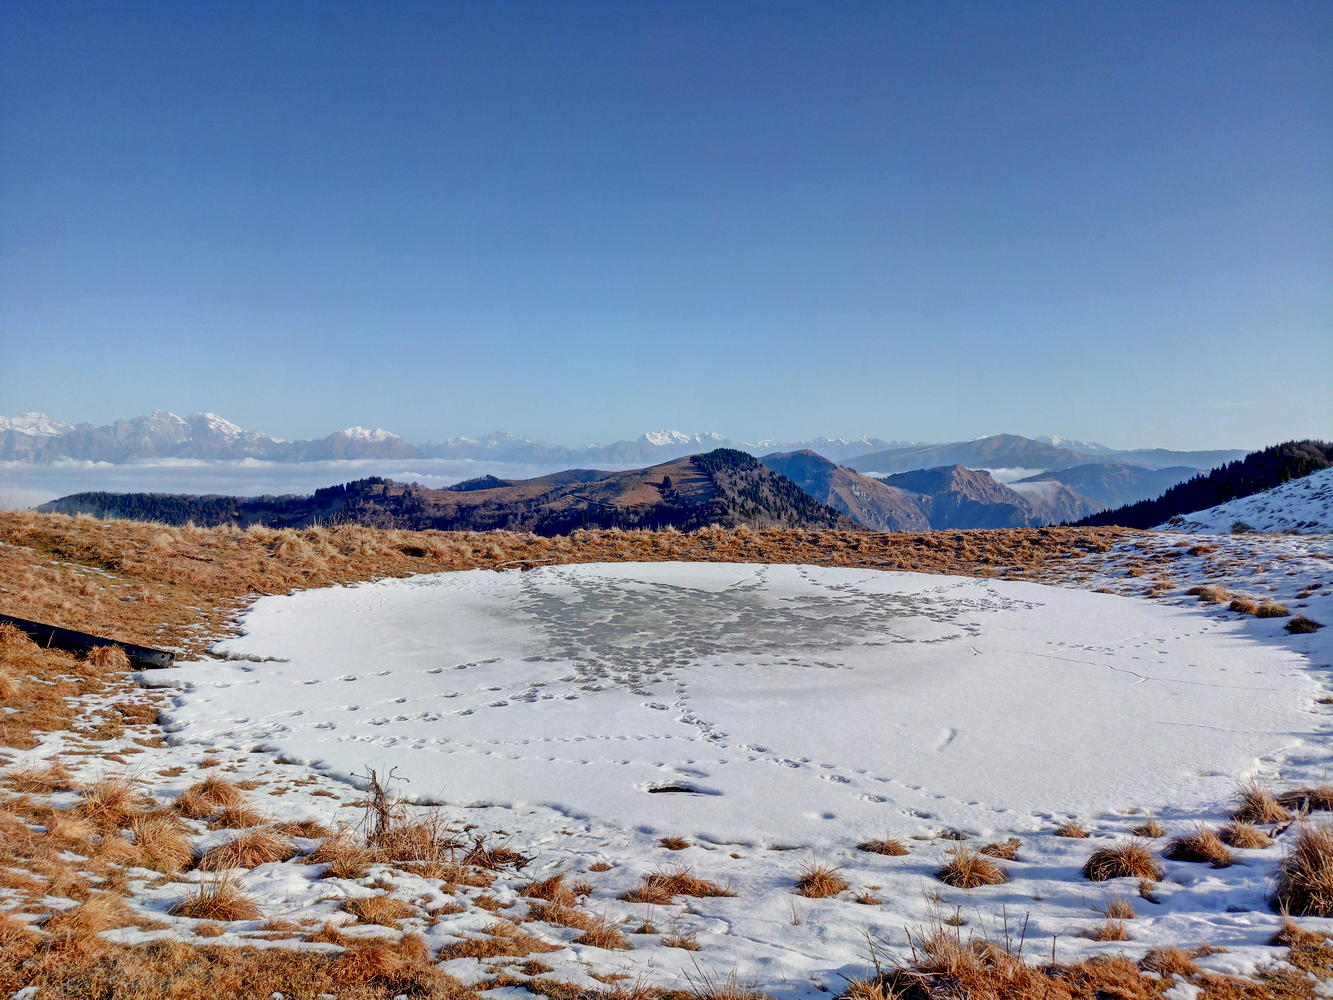 Lama-ghiacciata